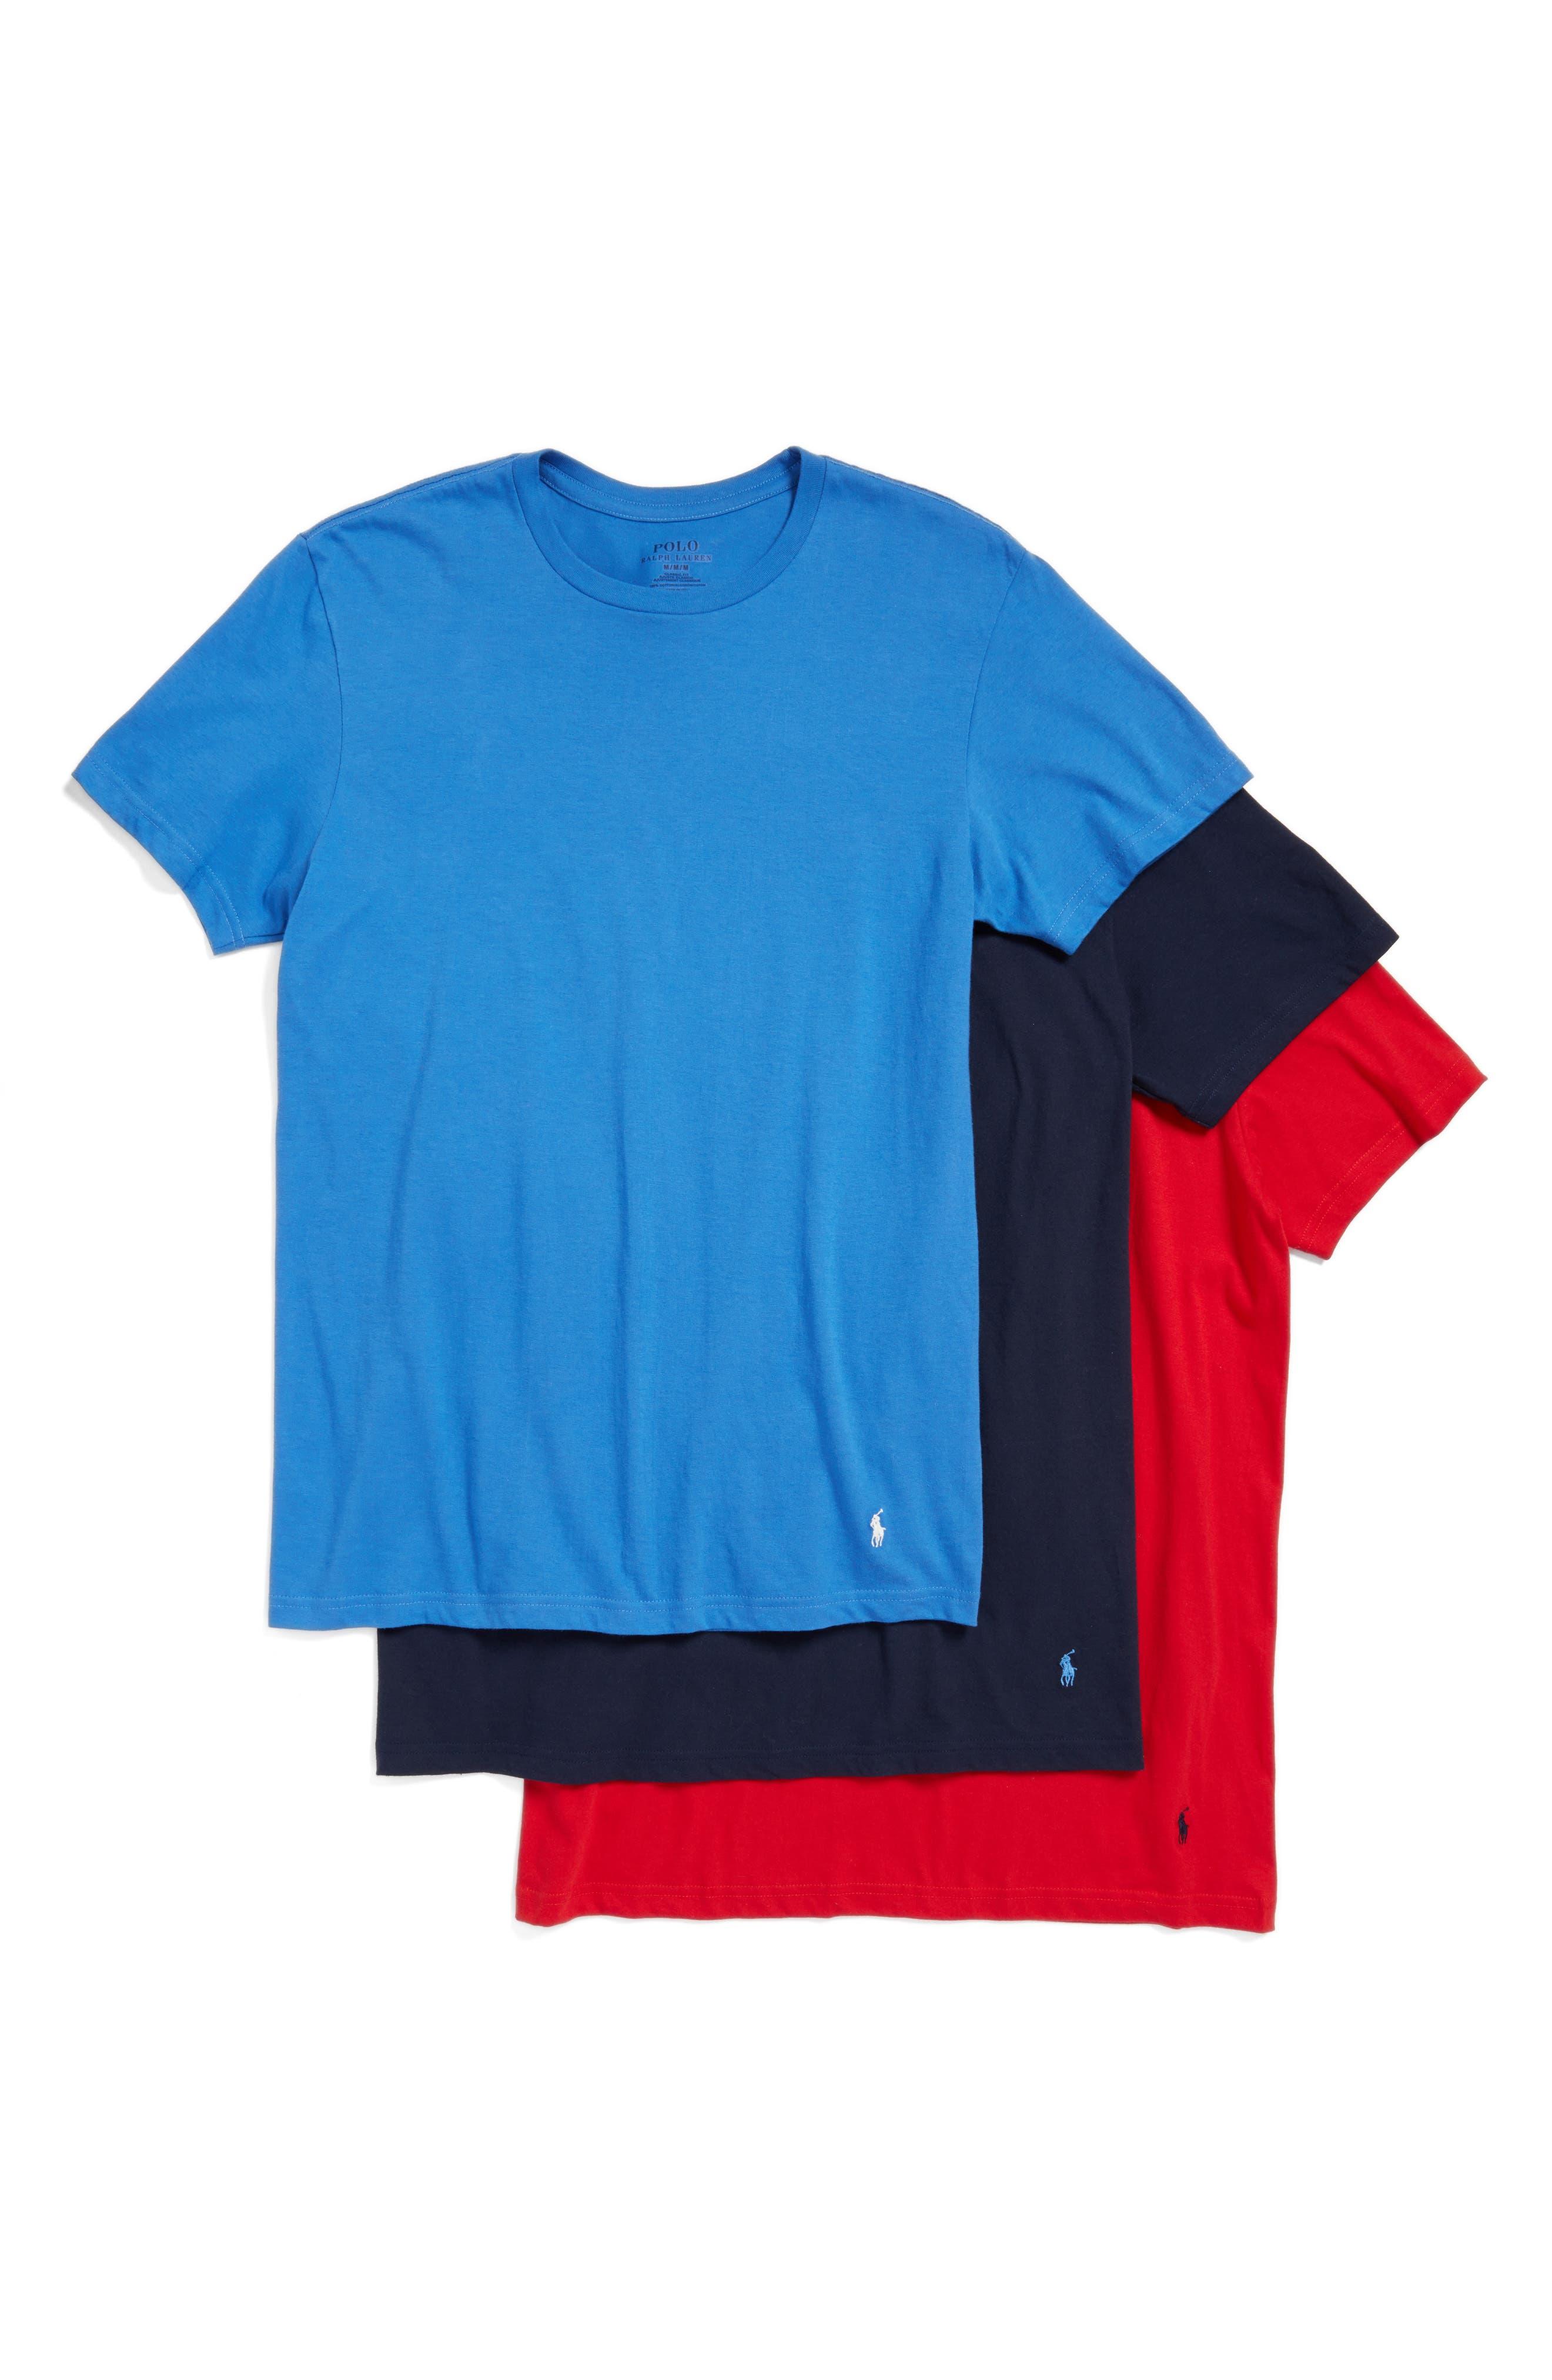 Polo Ralph Lauren 3-Pack Crewneck T-Shirts